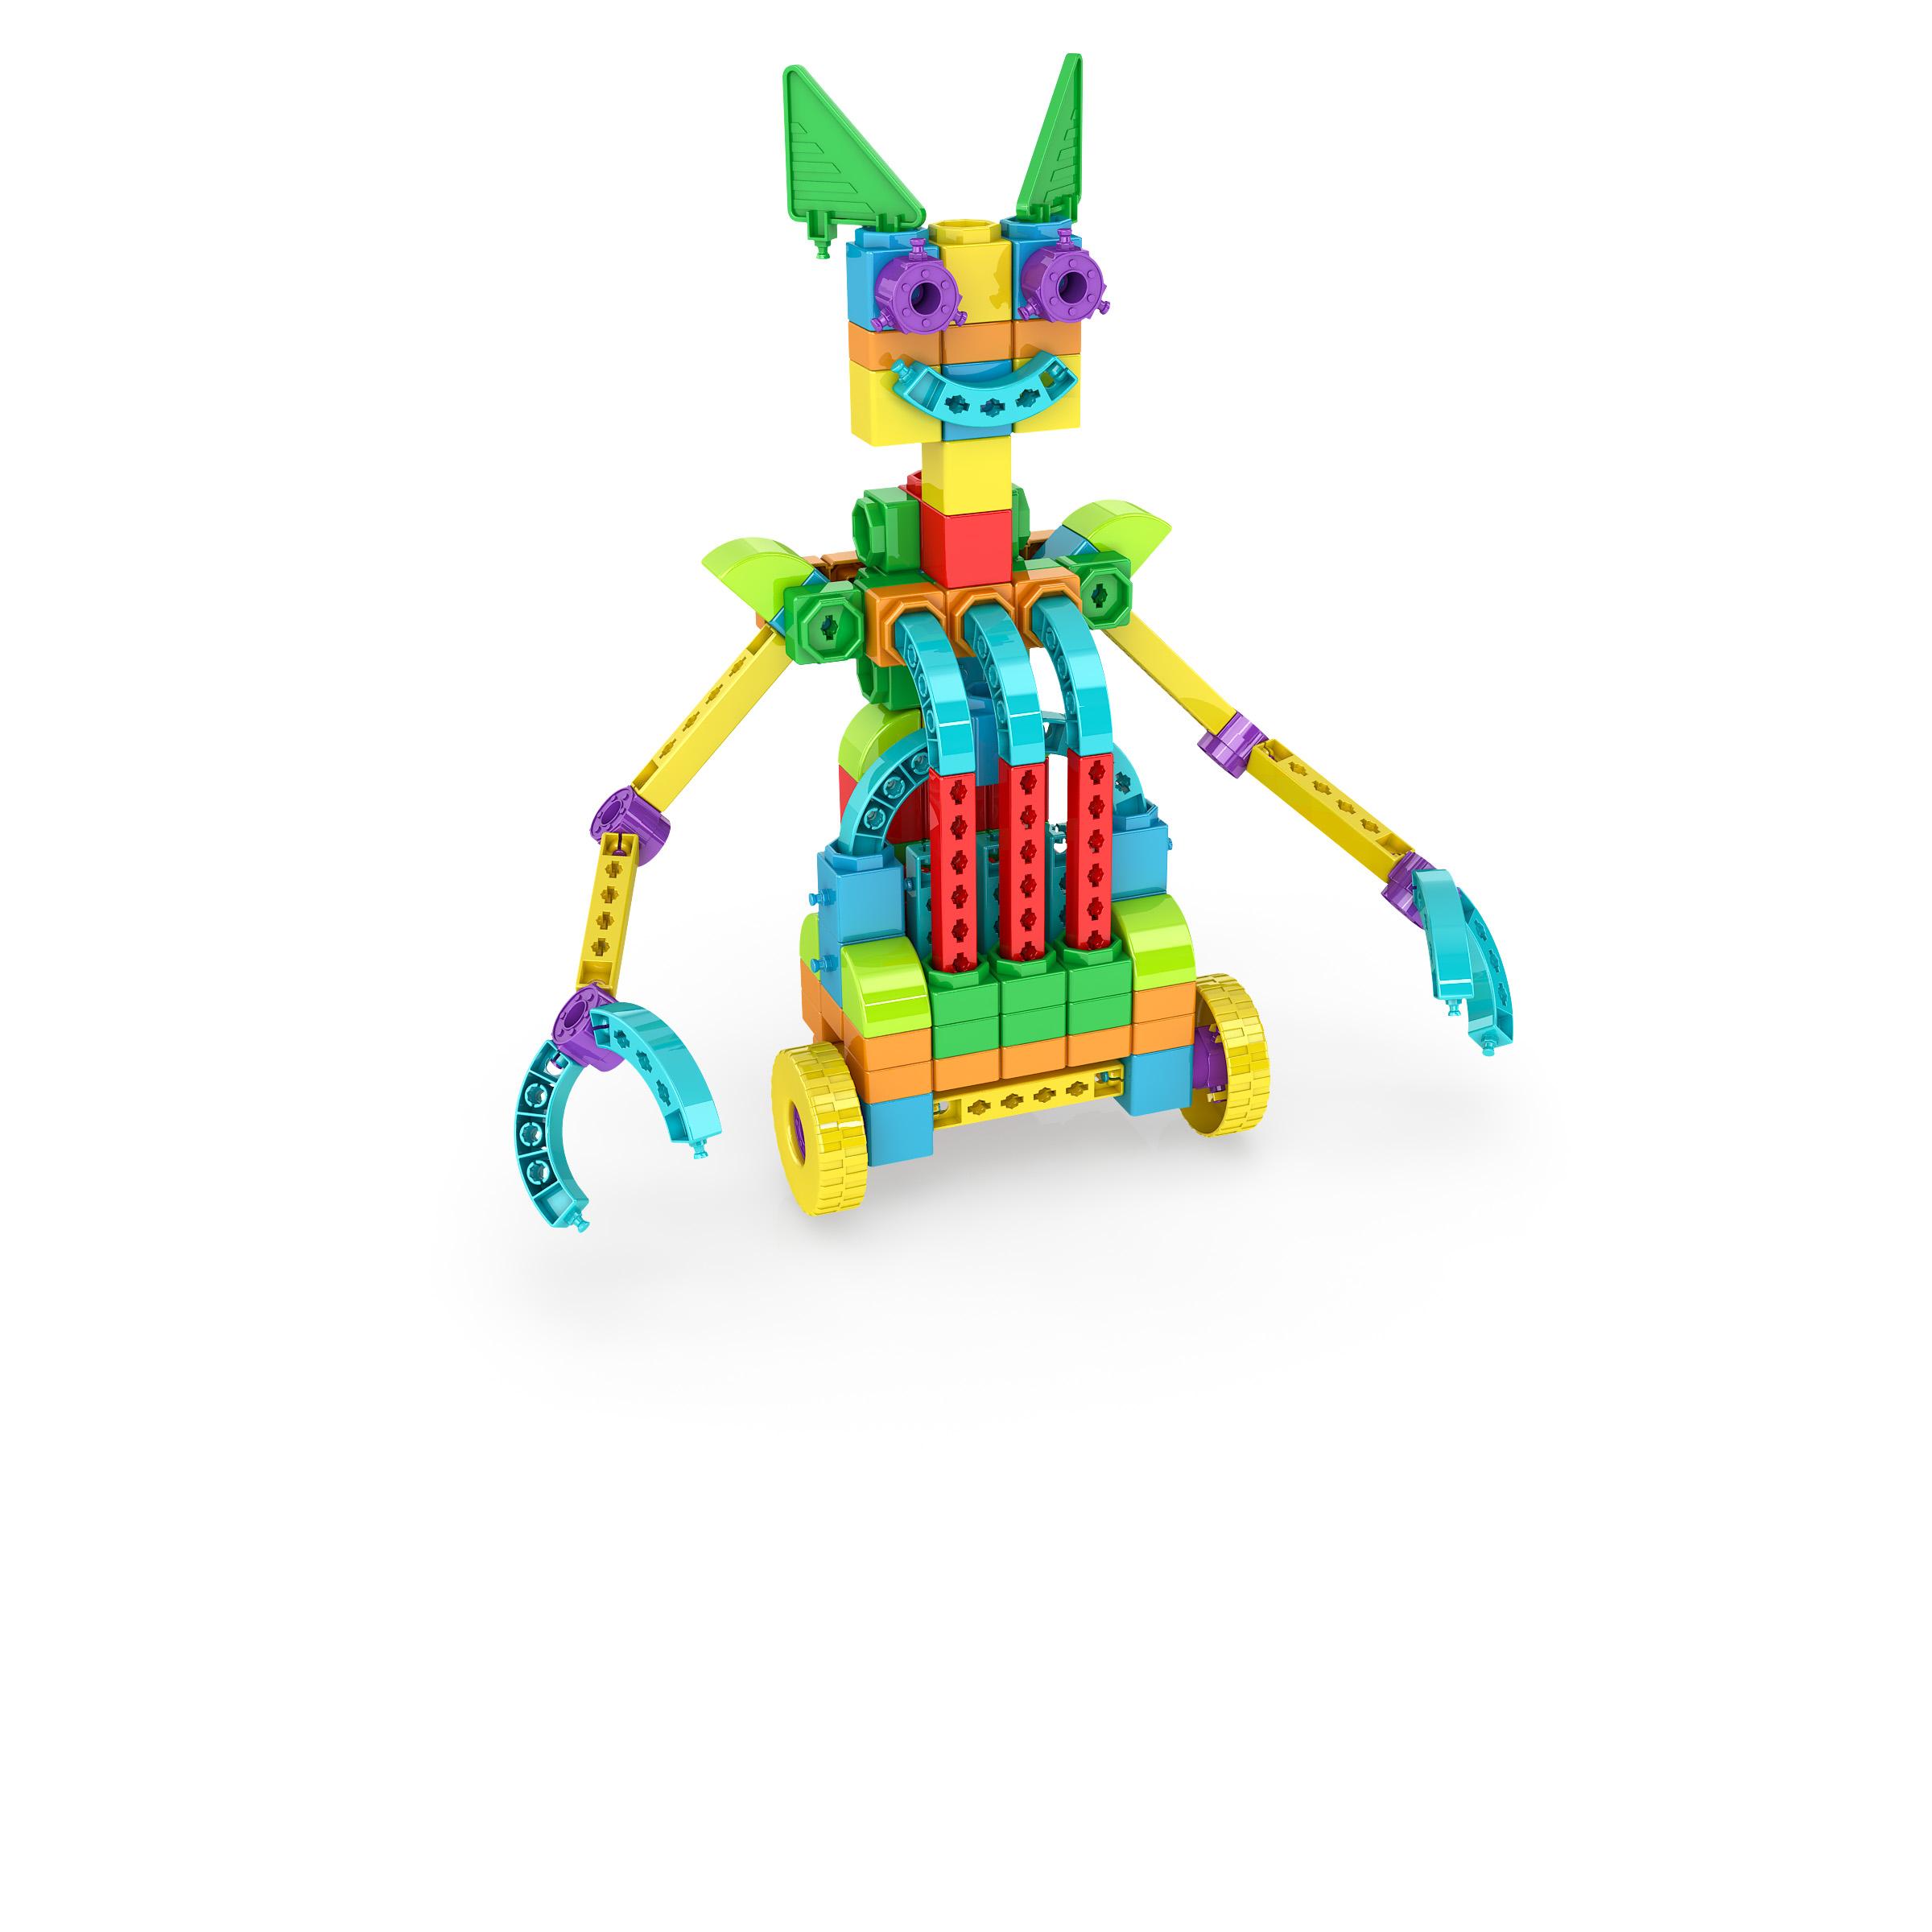 , Humanoid 1, משחקי חשיבה לילדים engino, משחקים לגיל הרך playgro, משחק הרכבות אנג'ינו, משחקי רכבות